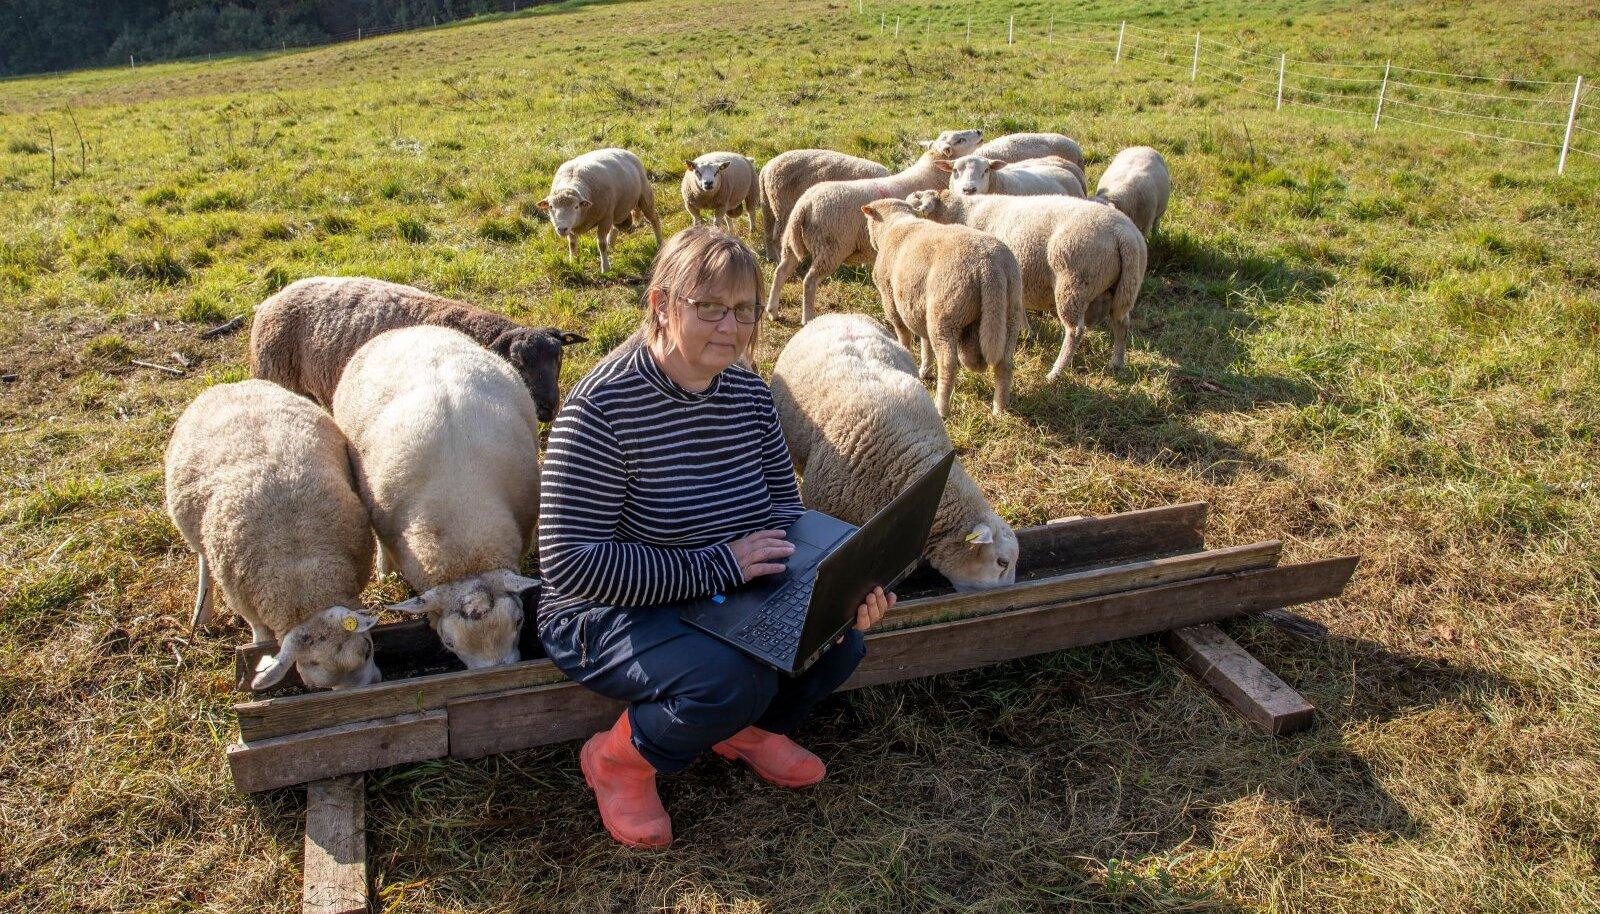 Ell Sellis, lambakasvataja, Väike-Hauka talu, Kanepi vald